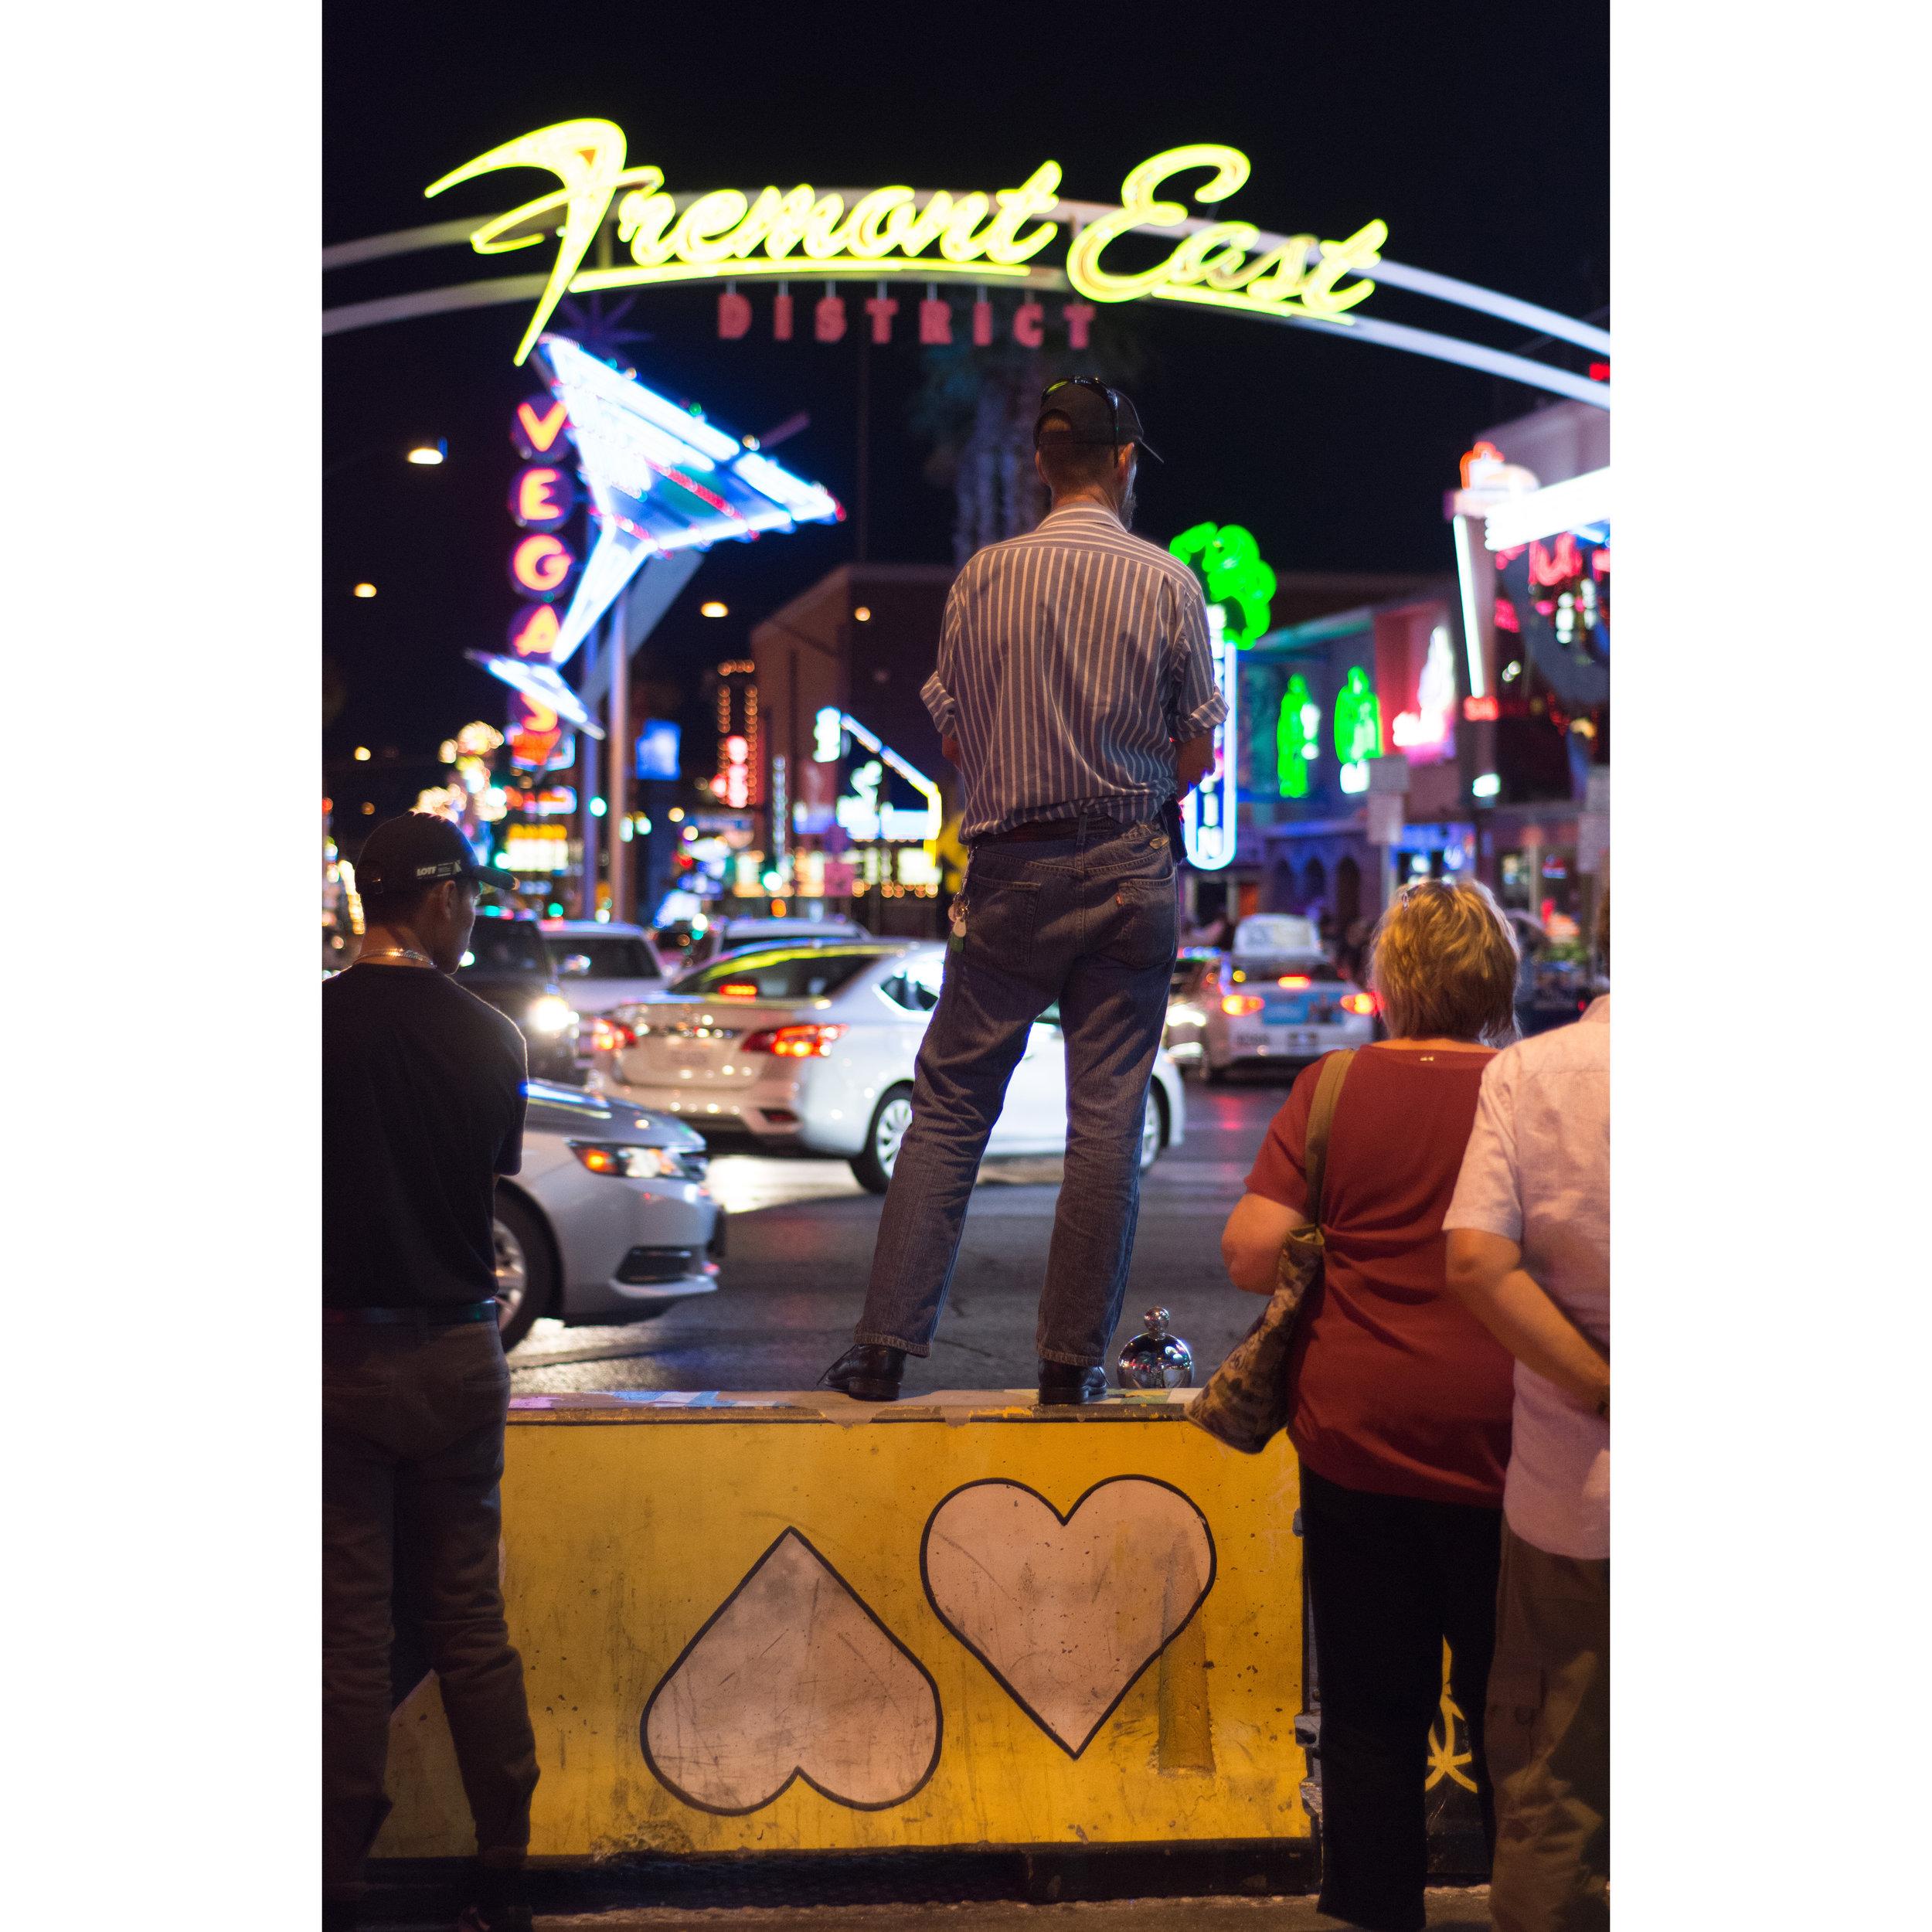 A man watches traffic on Fremont Street at Las Vegas Boulevard in downtown Las Vegas.